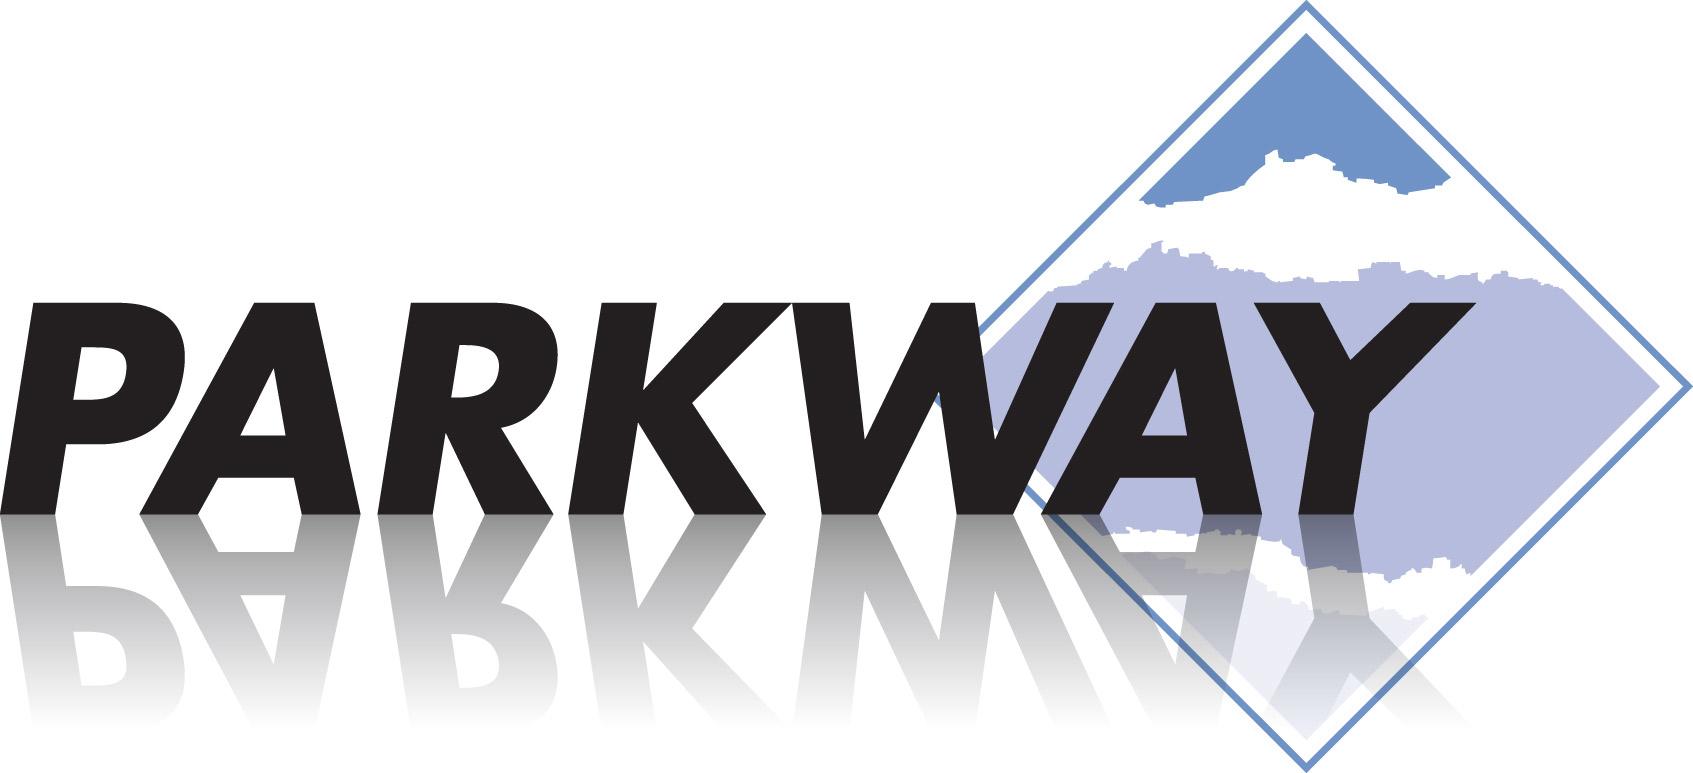 Parkway Buick, GMC